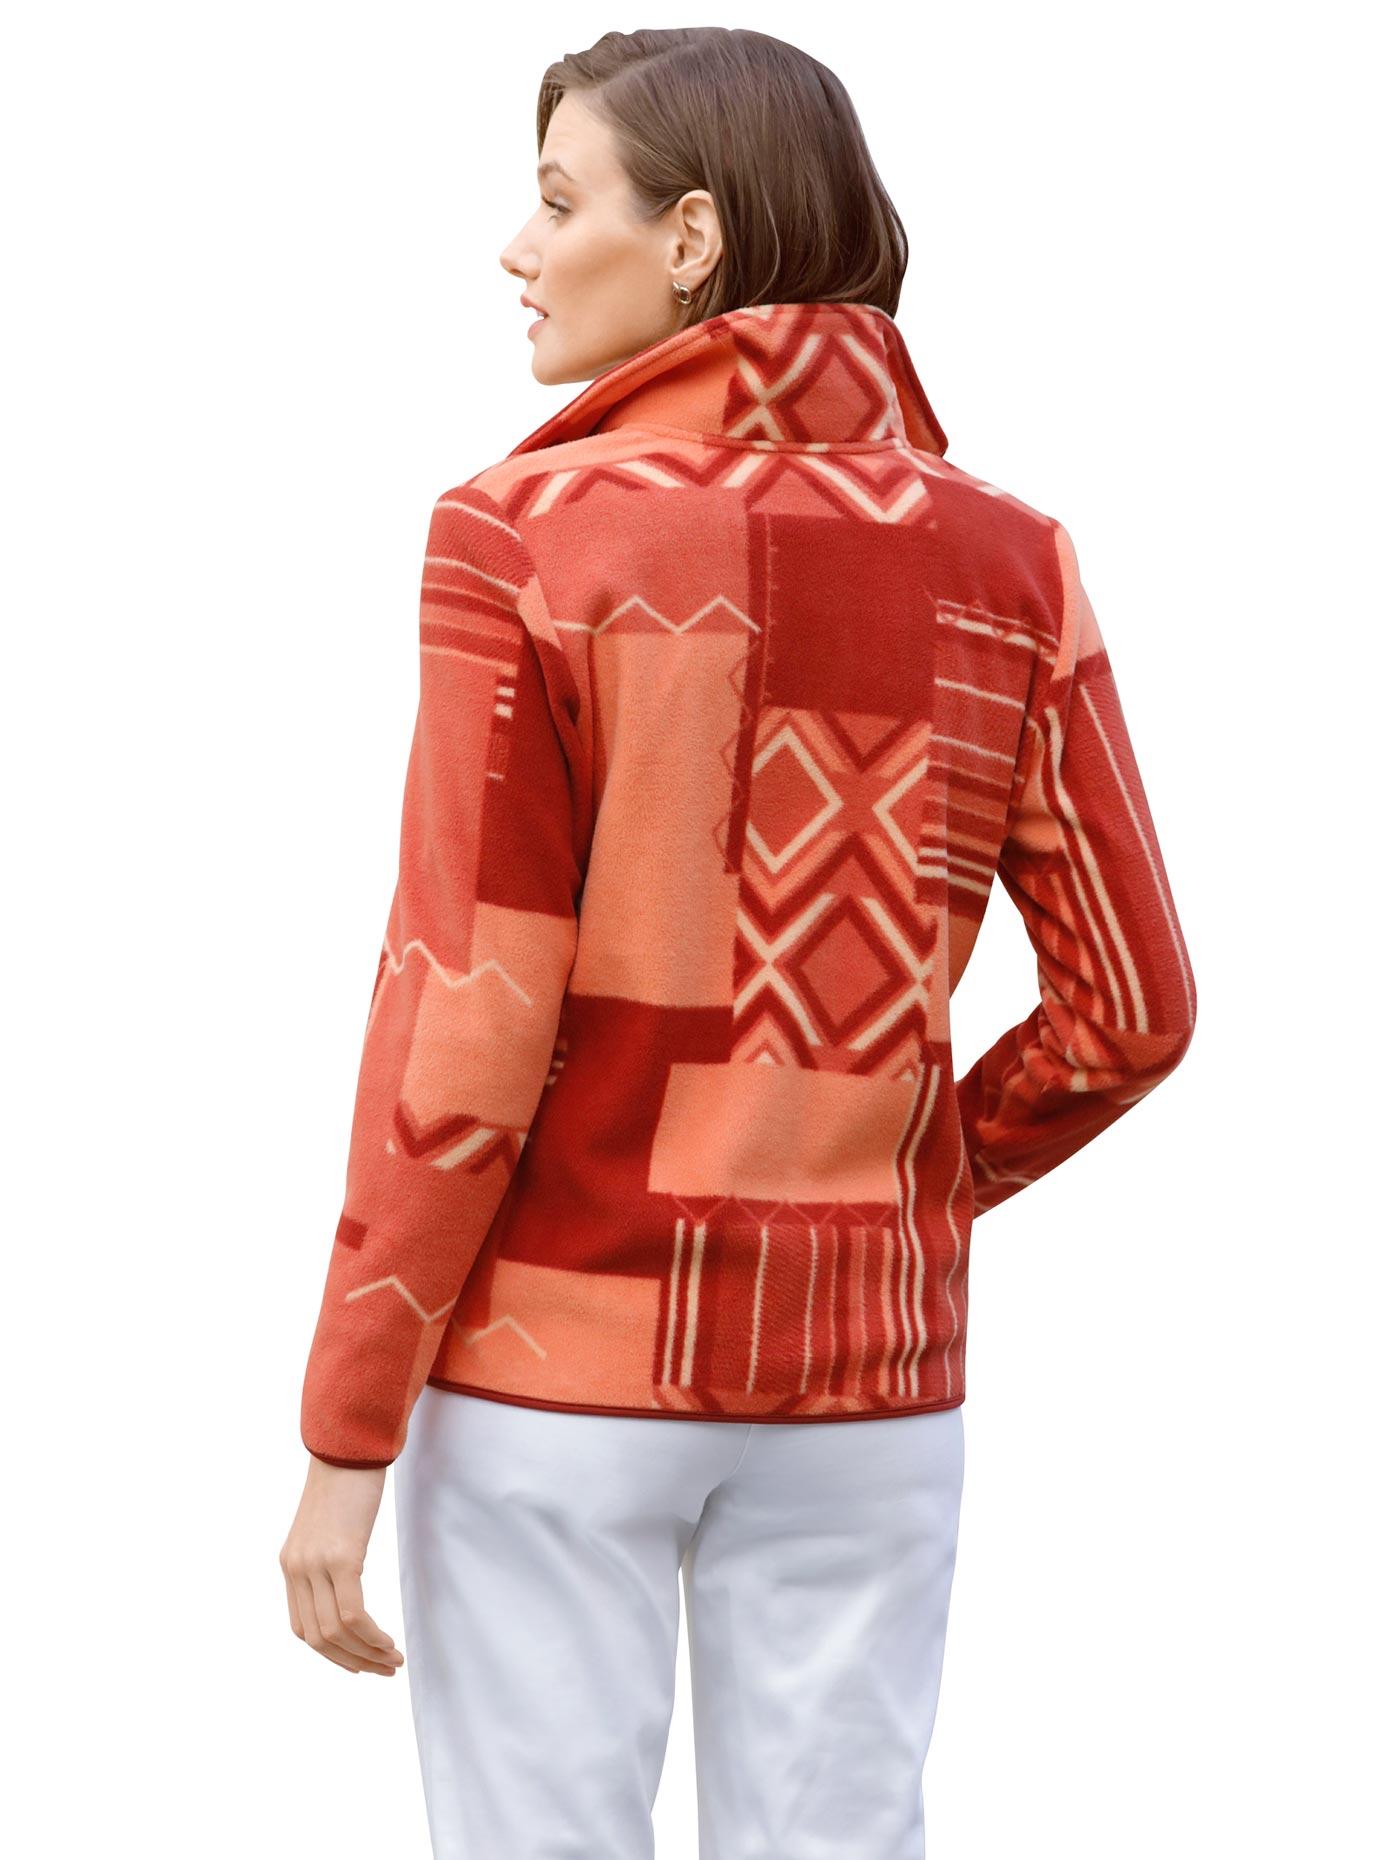 Classic Basics Fleece-Jacke mit Umlegekragen | Bekleidung > Jacken > Fleecejacken | Classic Basics